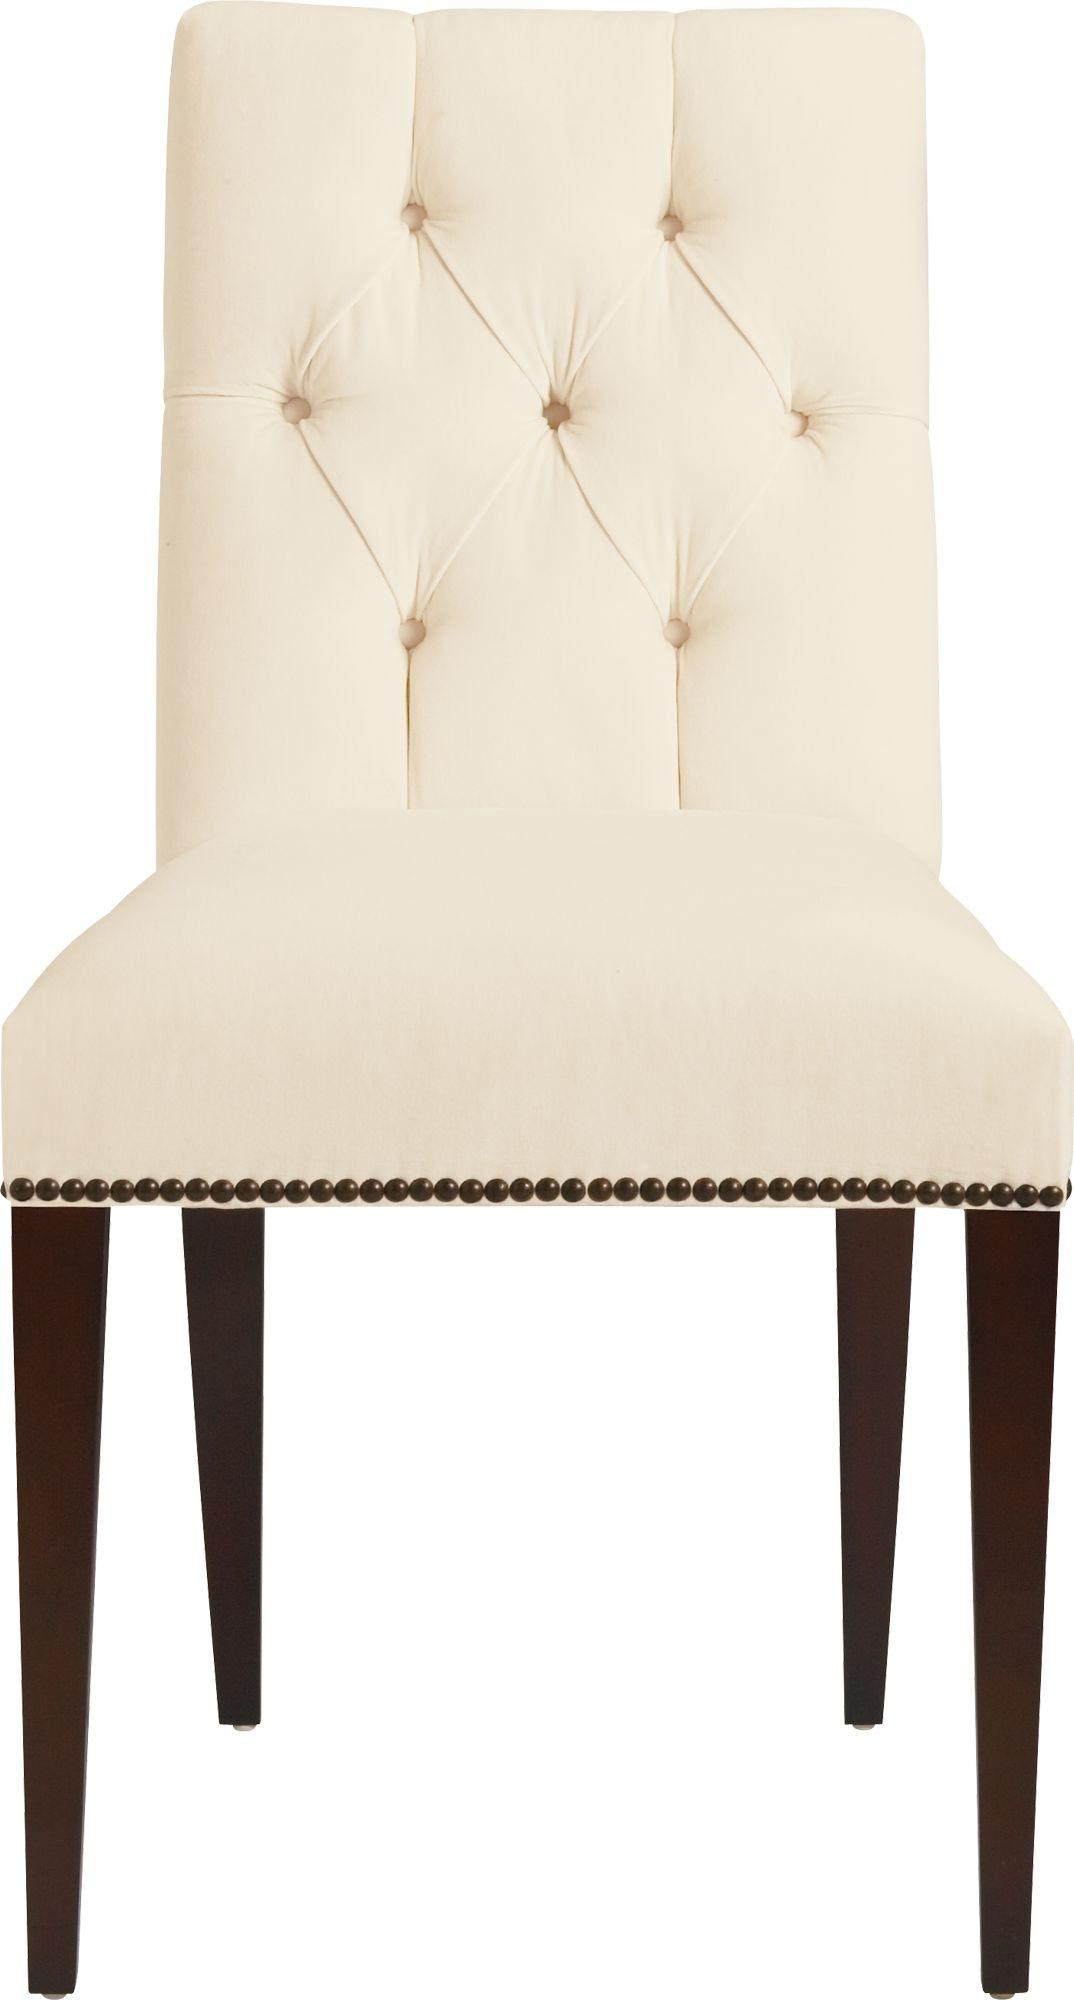 Baker Furniture Thomas Pheasant St. Germain Side Chair 7846